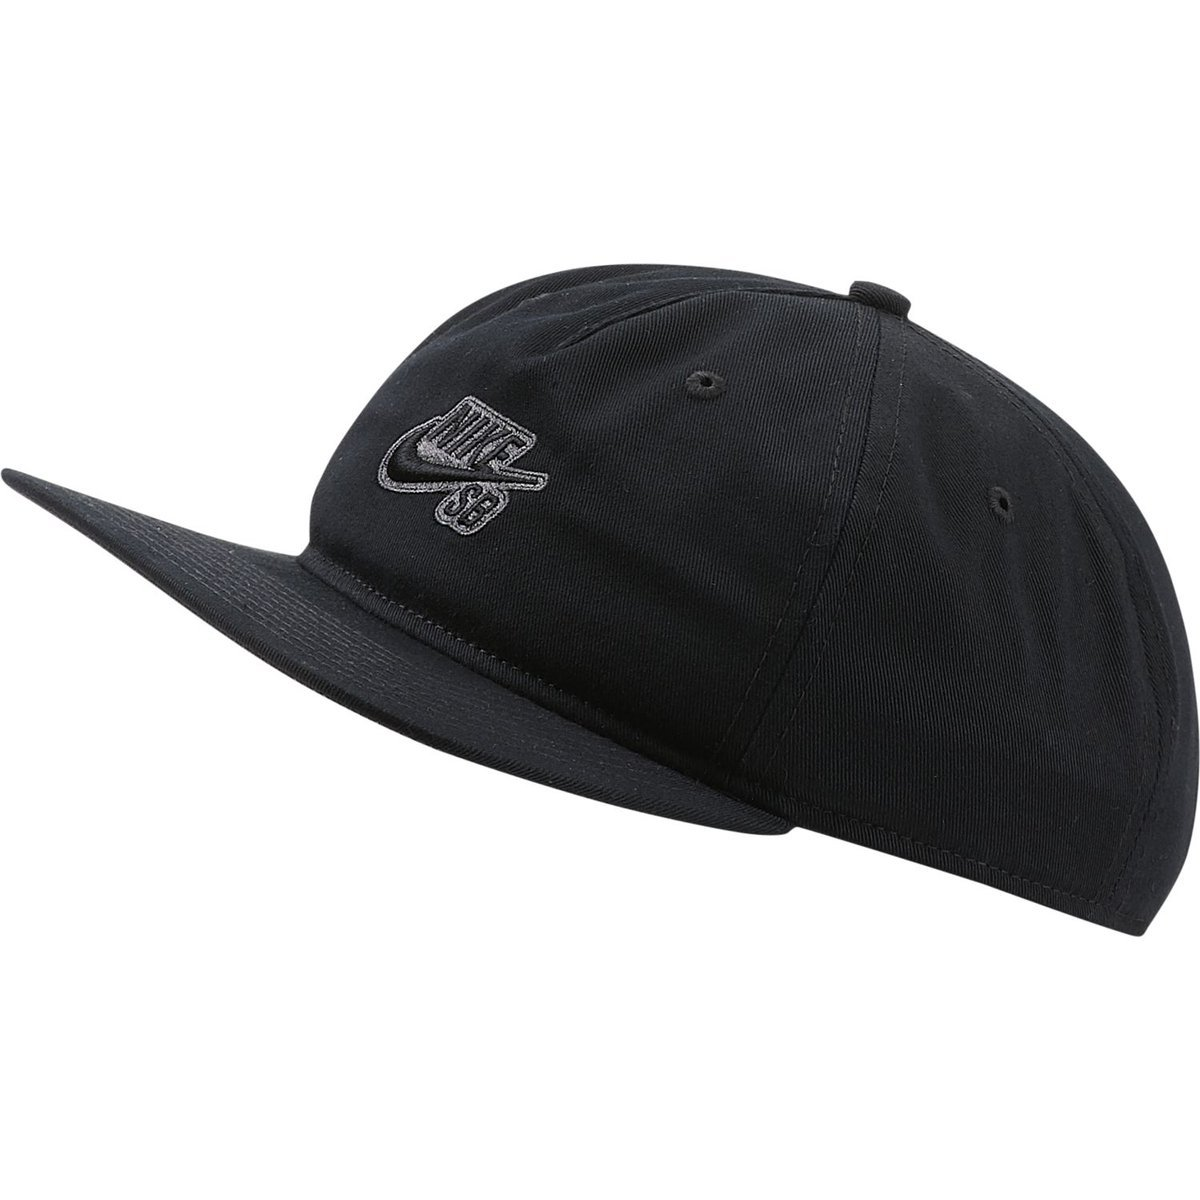 altavoz Sindicato hierba  NIKE SB BLACK/ANTHRACITE/BLACK BLACK   Clothes \ Cap \ Cap Brands \ Nike SB  SALE \ Sale - 40% \ Cap   Skateshop Miniramp.pl